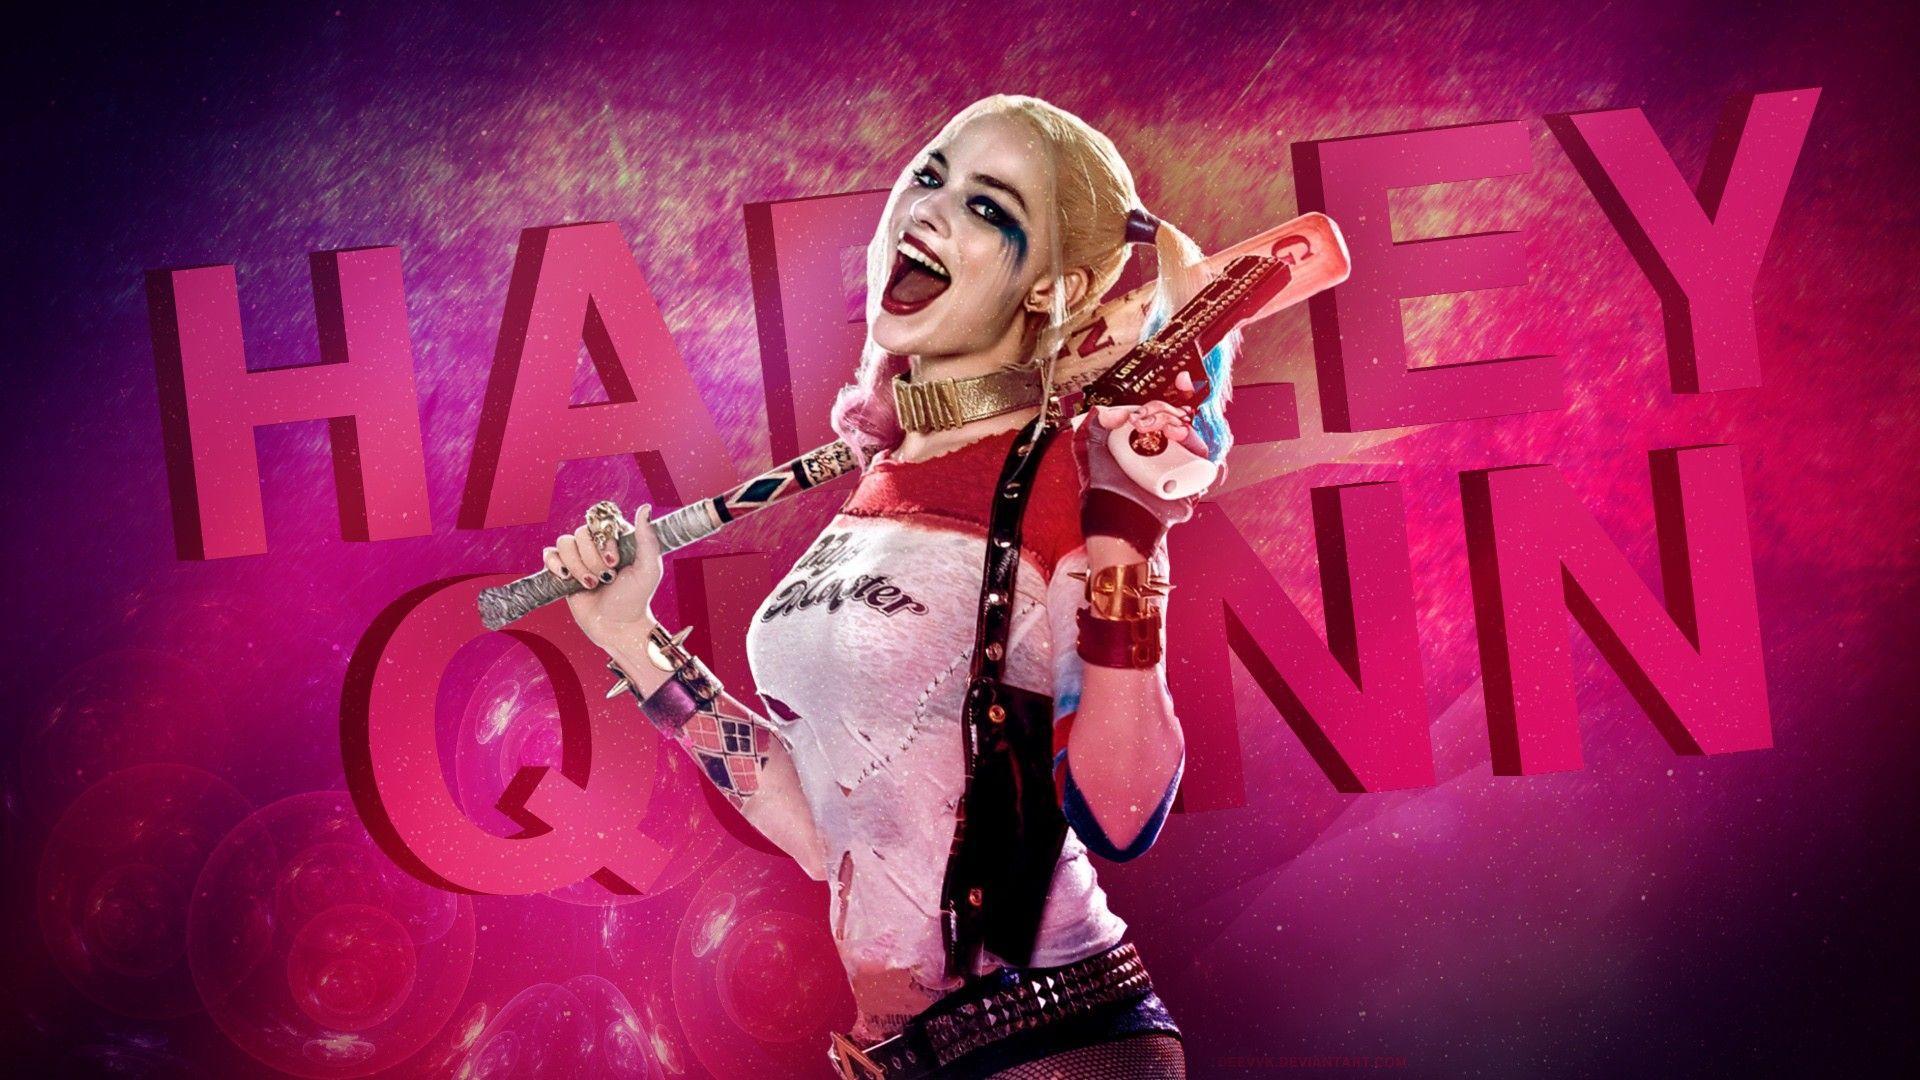 Margot Robbie As Harley Quinn Wallpaper: 4K Harley Quinn Wallpapers